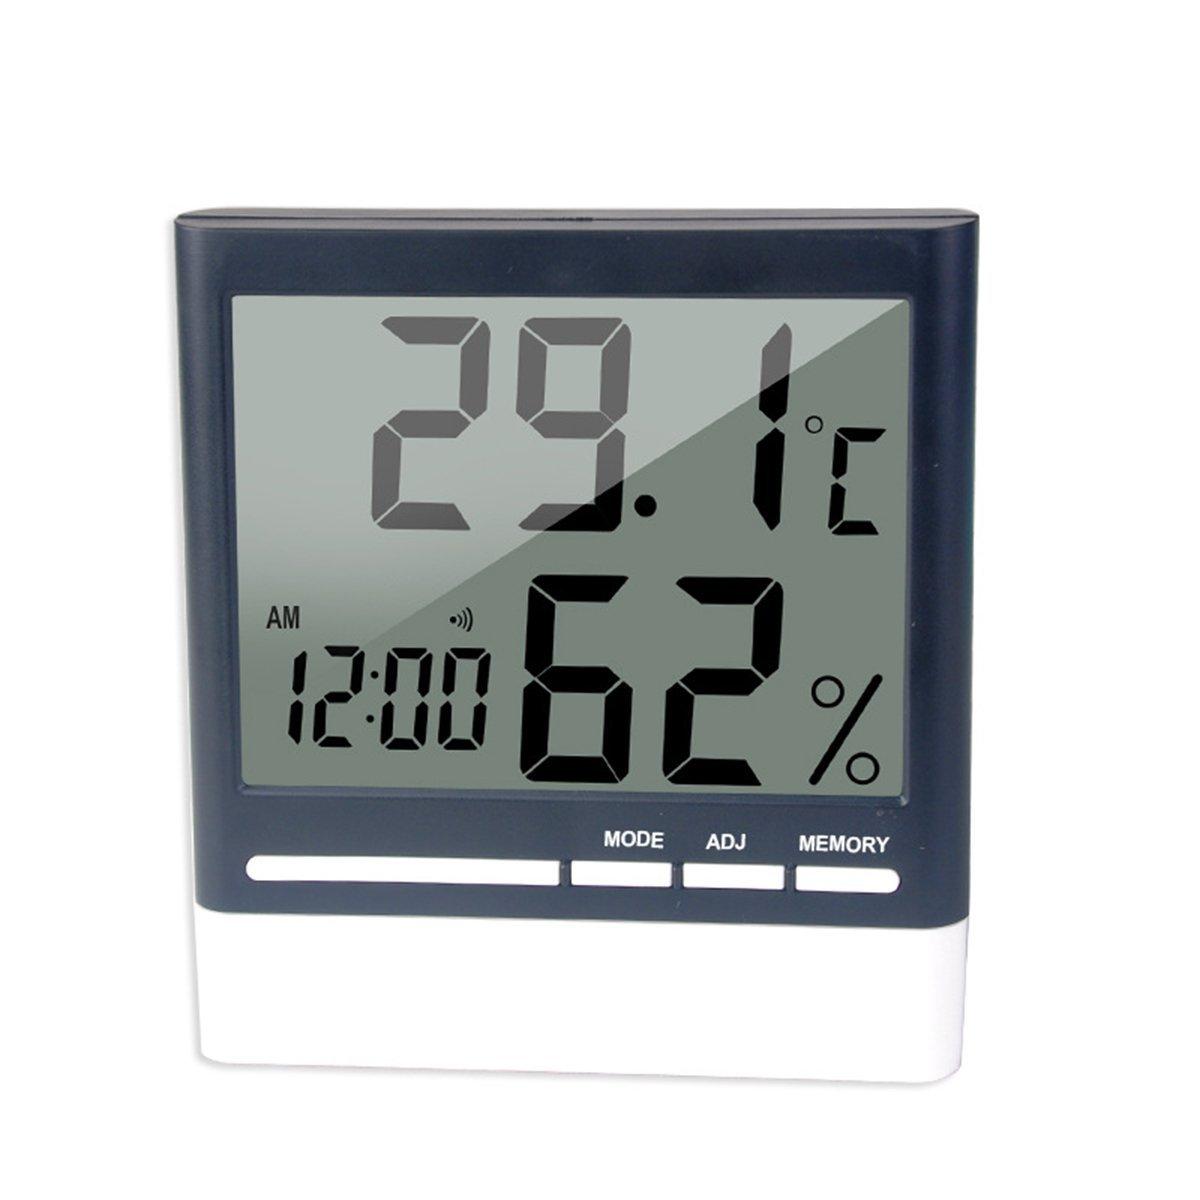 BESTOMZ Digital Hygrometer Clock Large LCD Display Indoor Thermometer Humidity Monitor Temperature Humidity Gauge